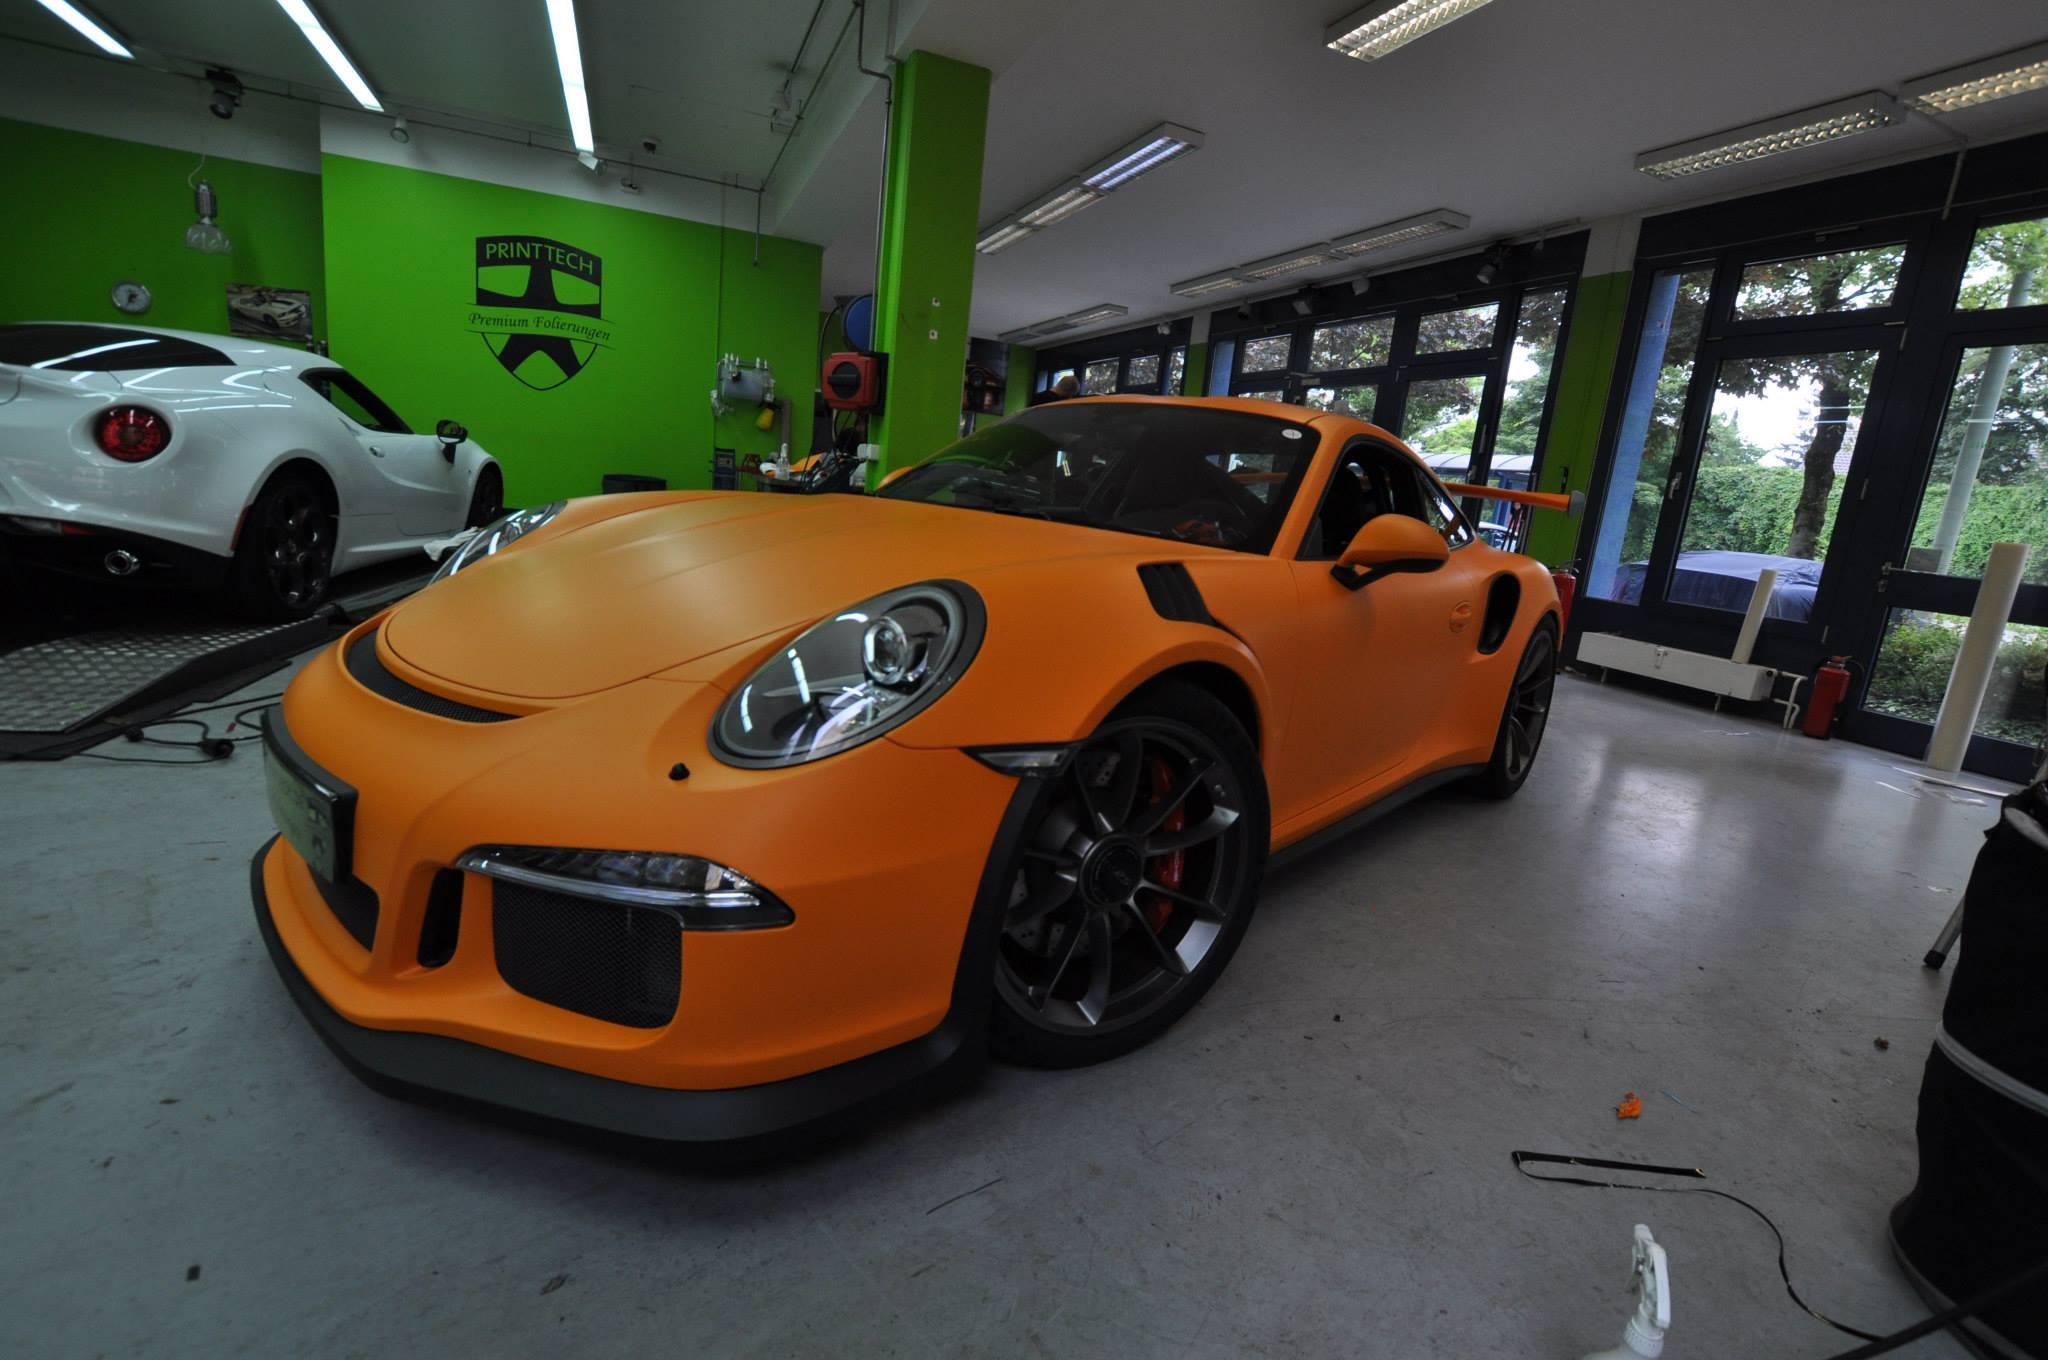 2016 porsche 911 gt3 rs gets retro look with racing orange matt wrap autoevolution. Black Bedroom Furniture Sets. Home Design Ideas